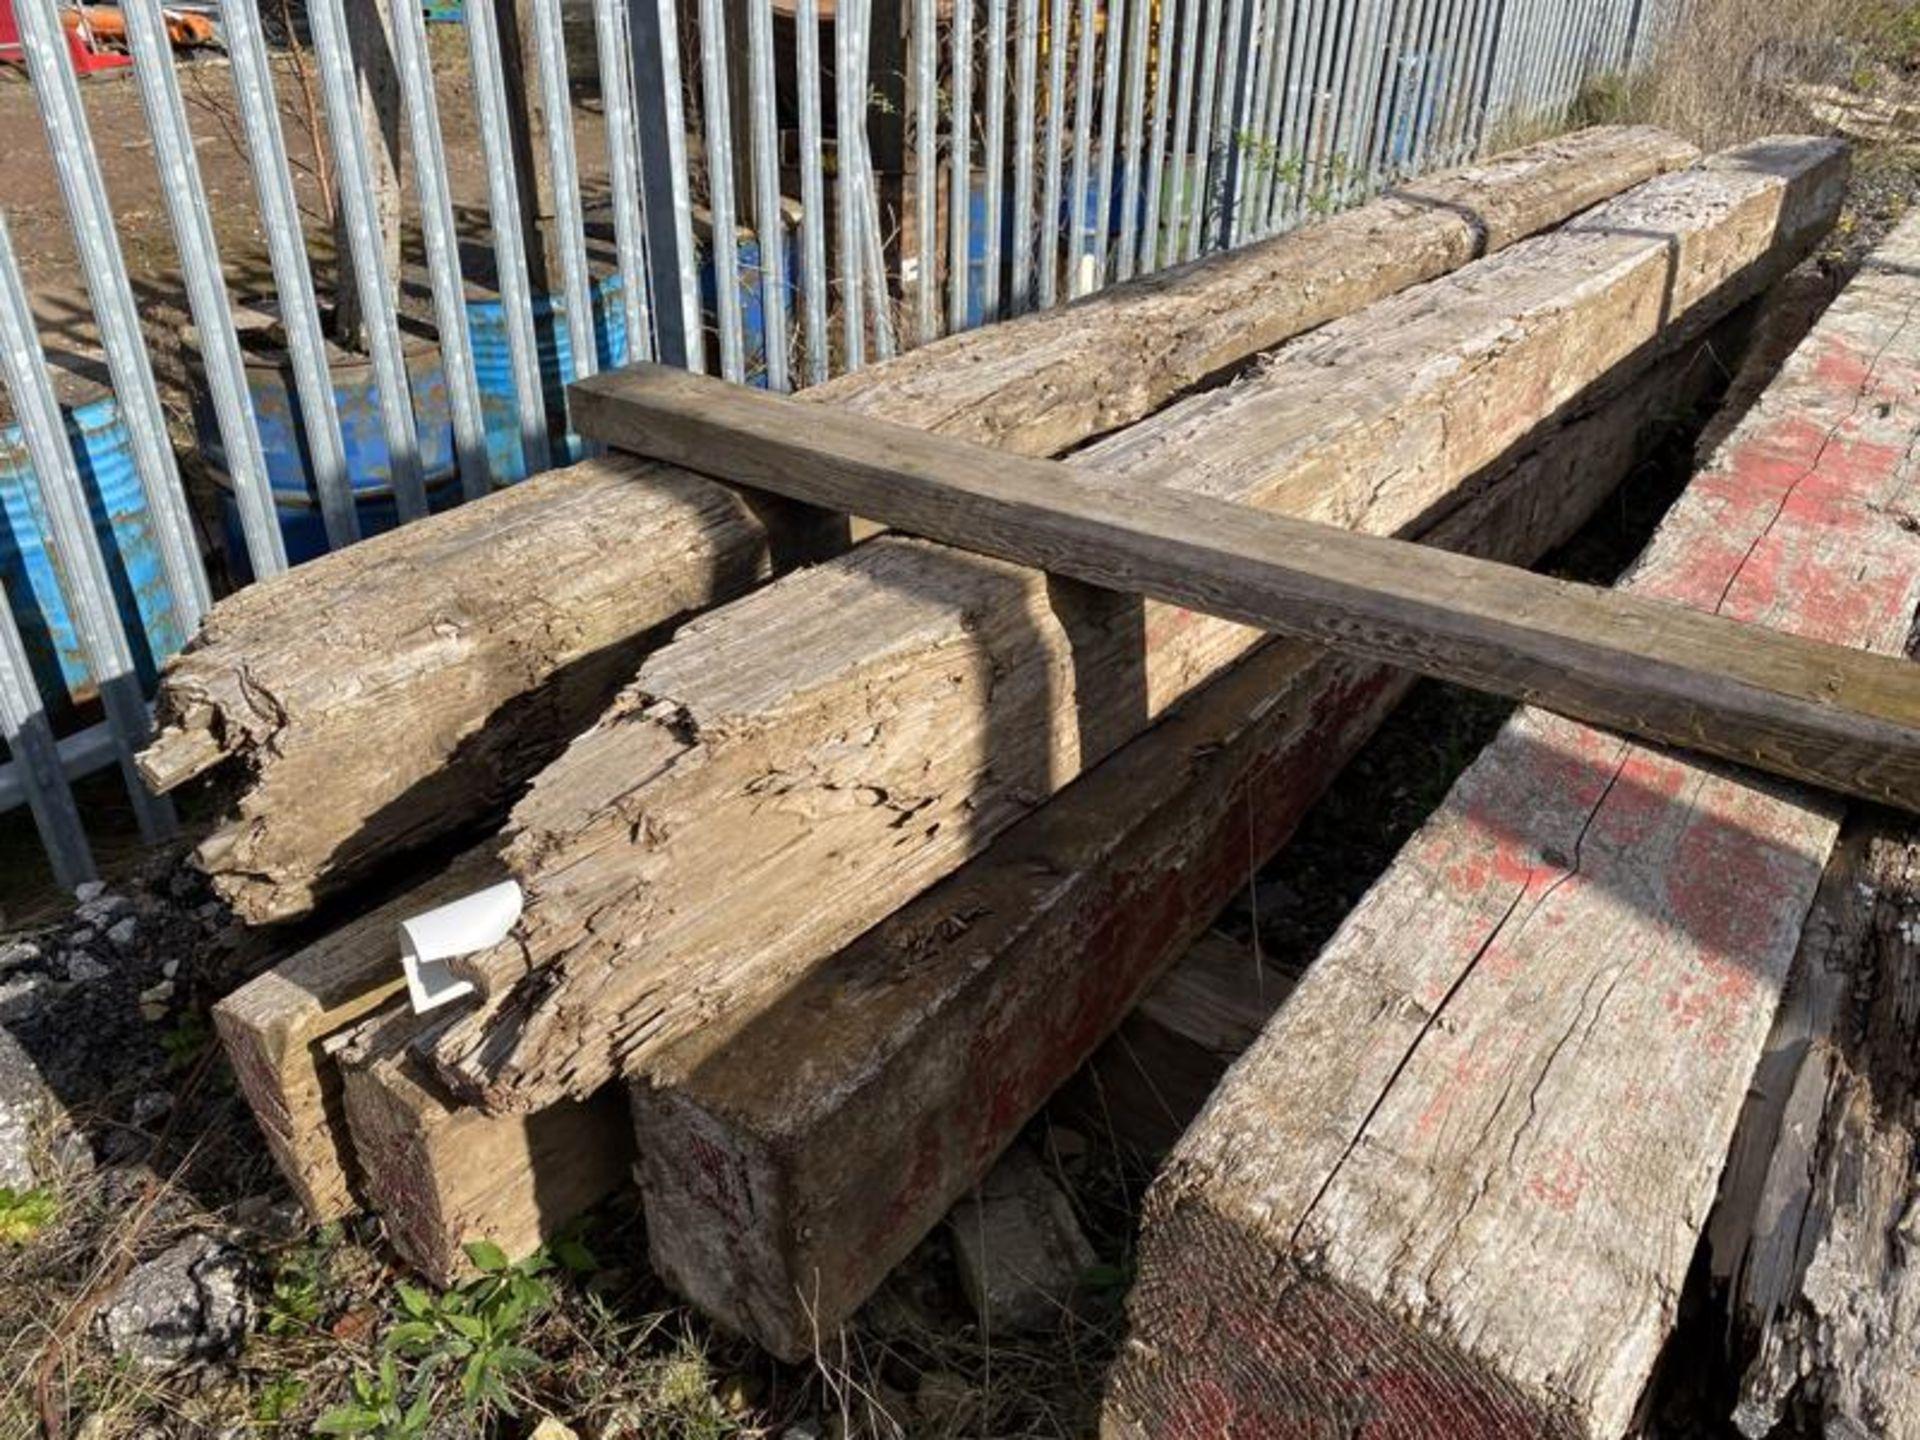 Lot 165 - Five Timber Baulks, each approx. 300mm x 300mm x m